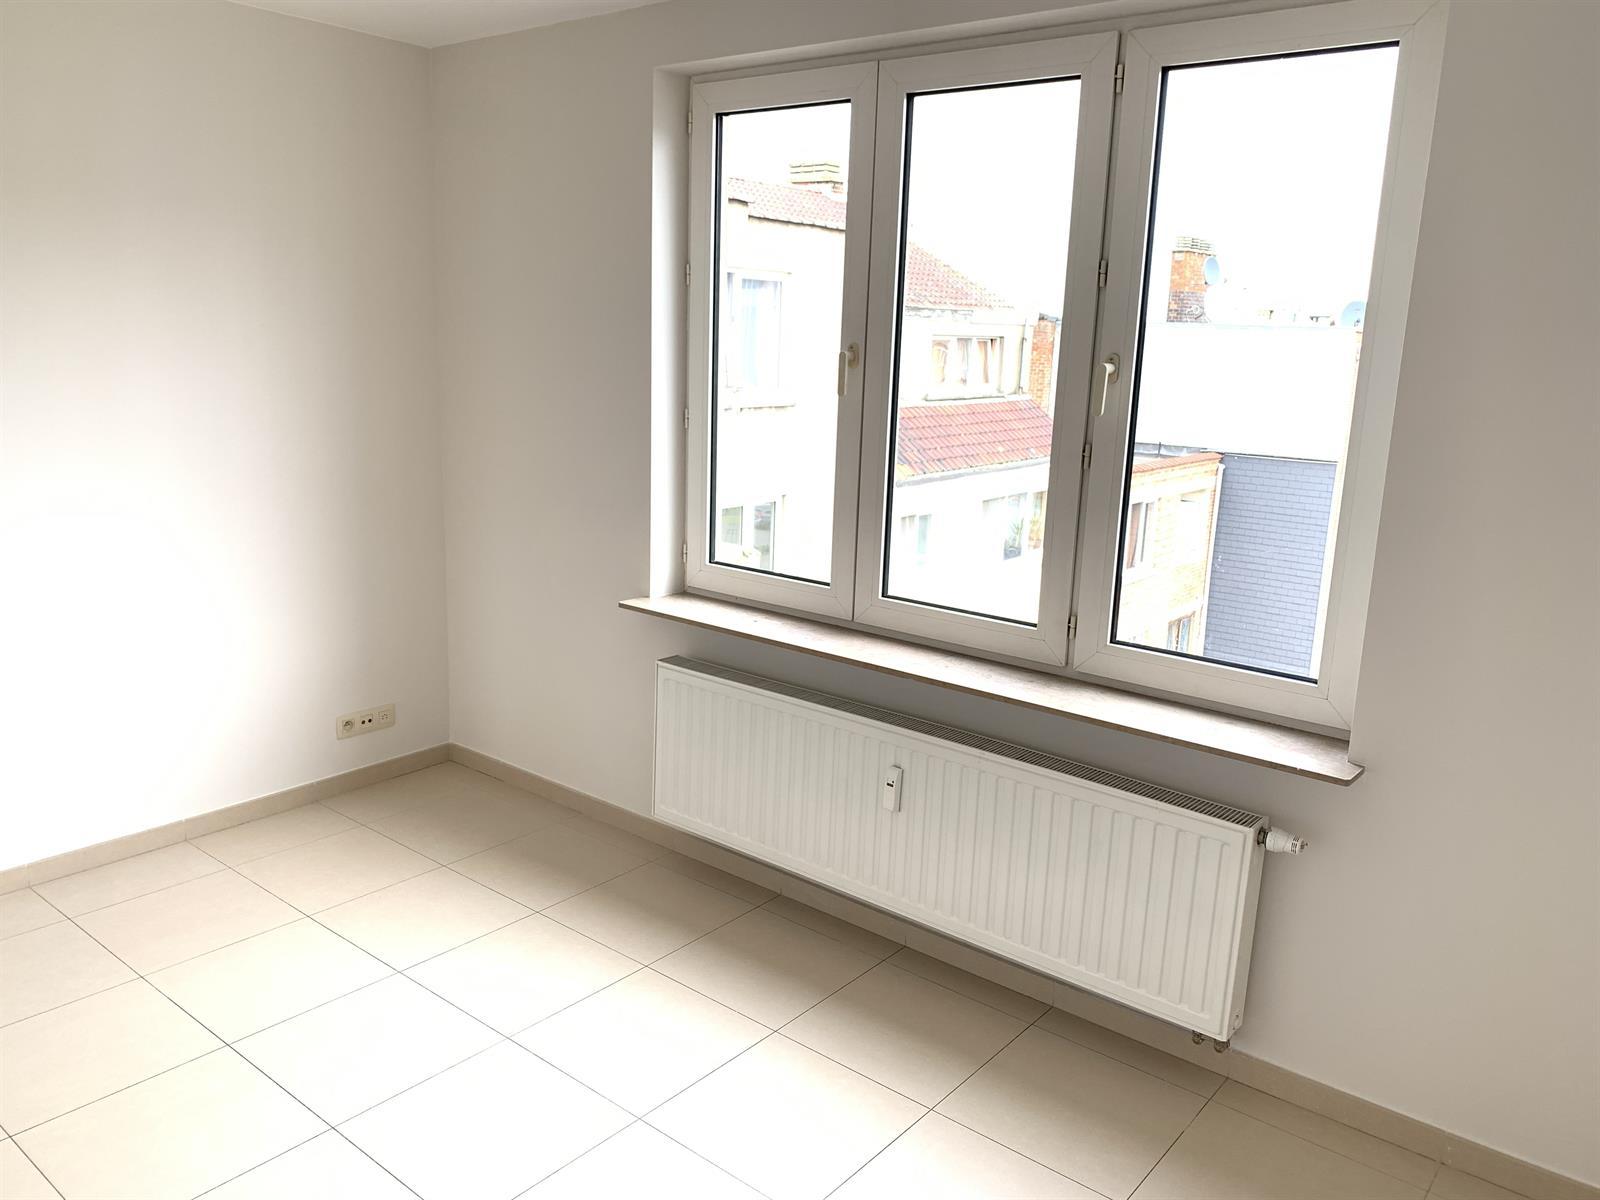 Appartement - Molenbeek-Saint-Jean - #4252746-4